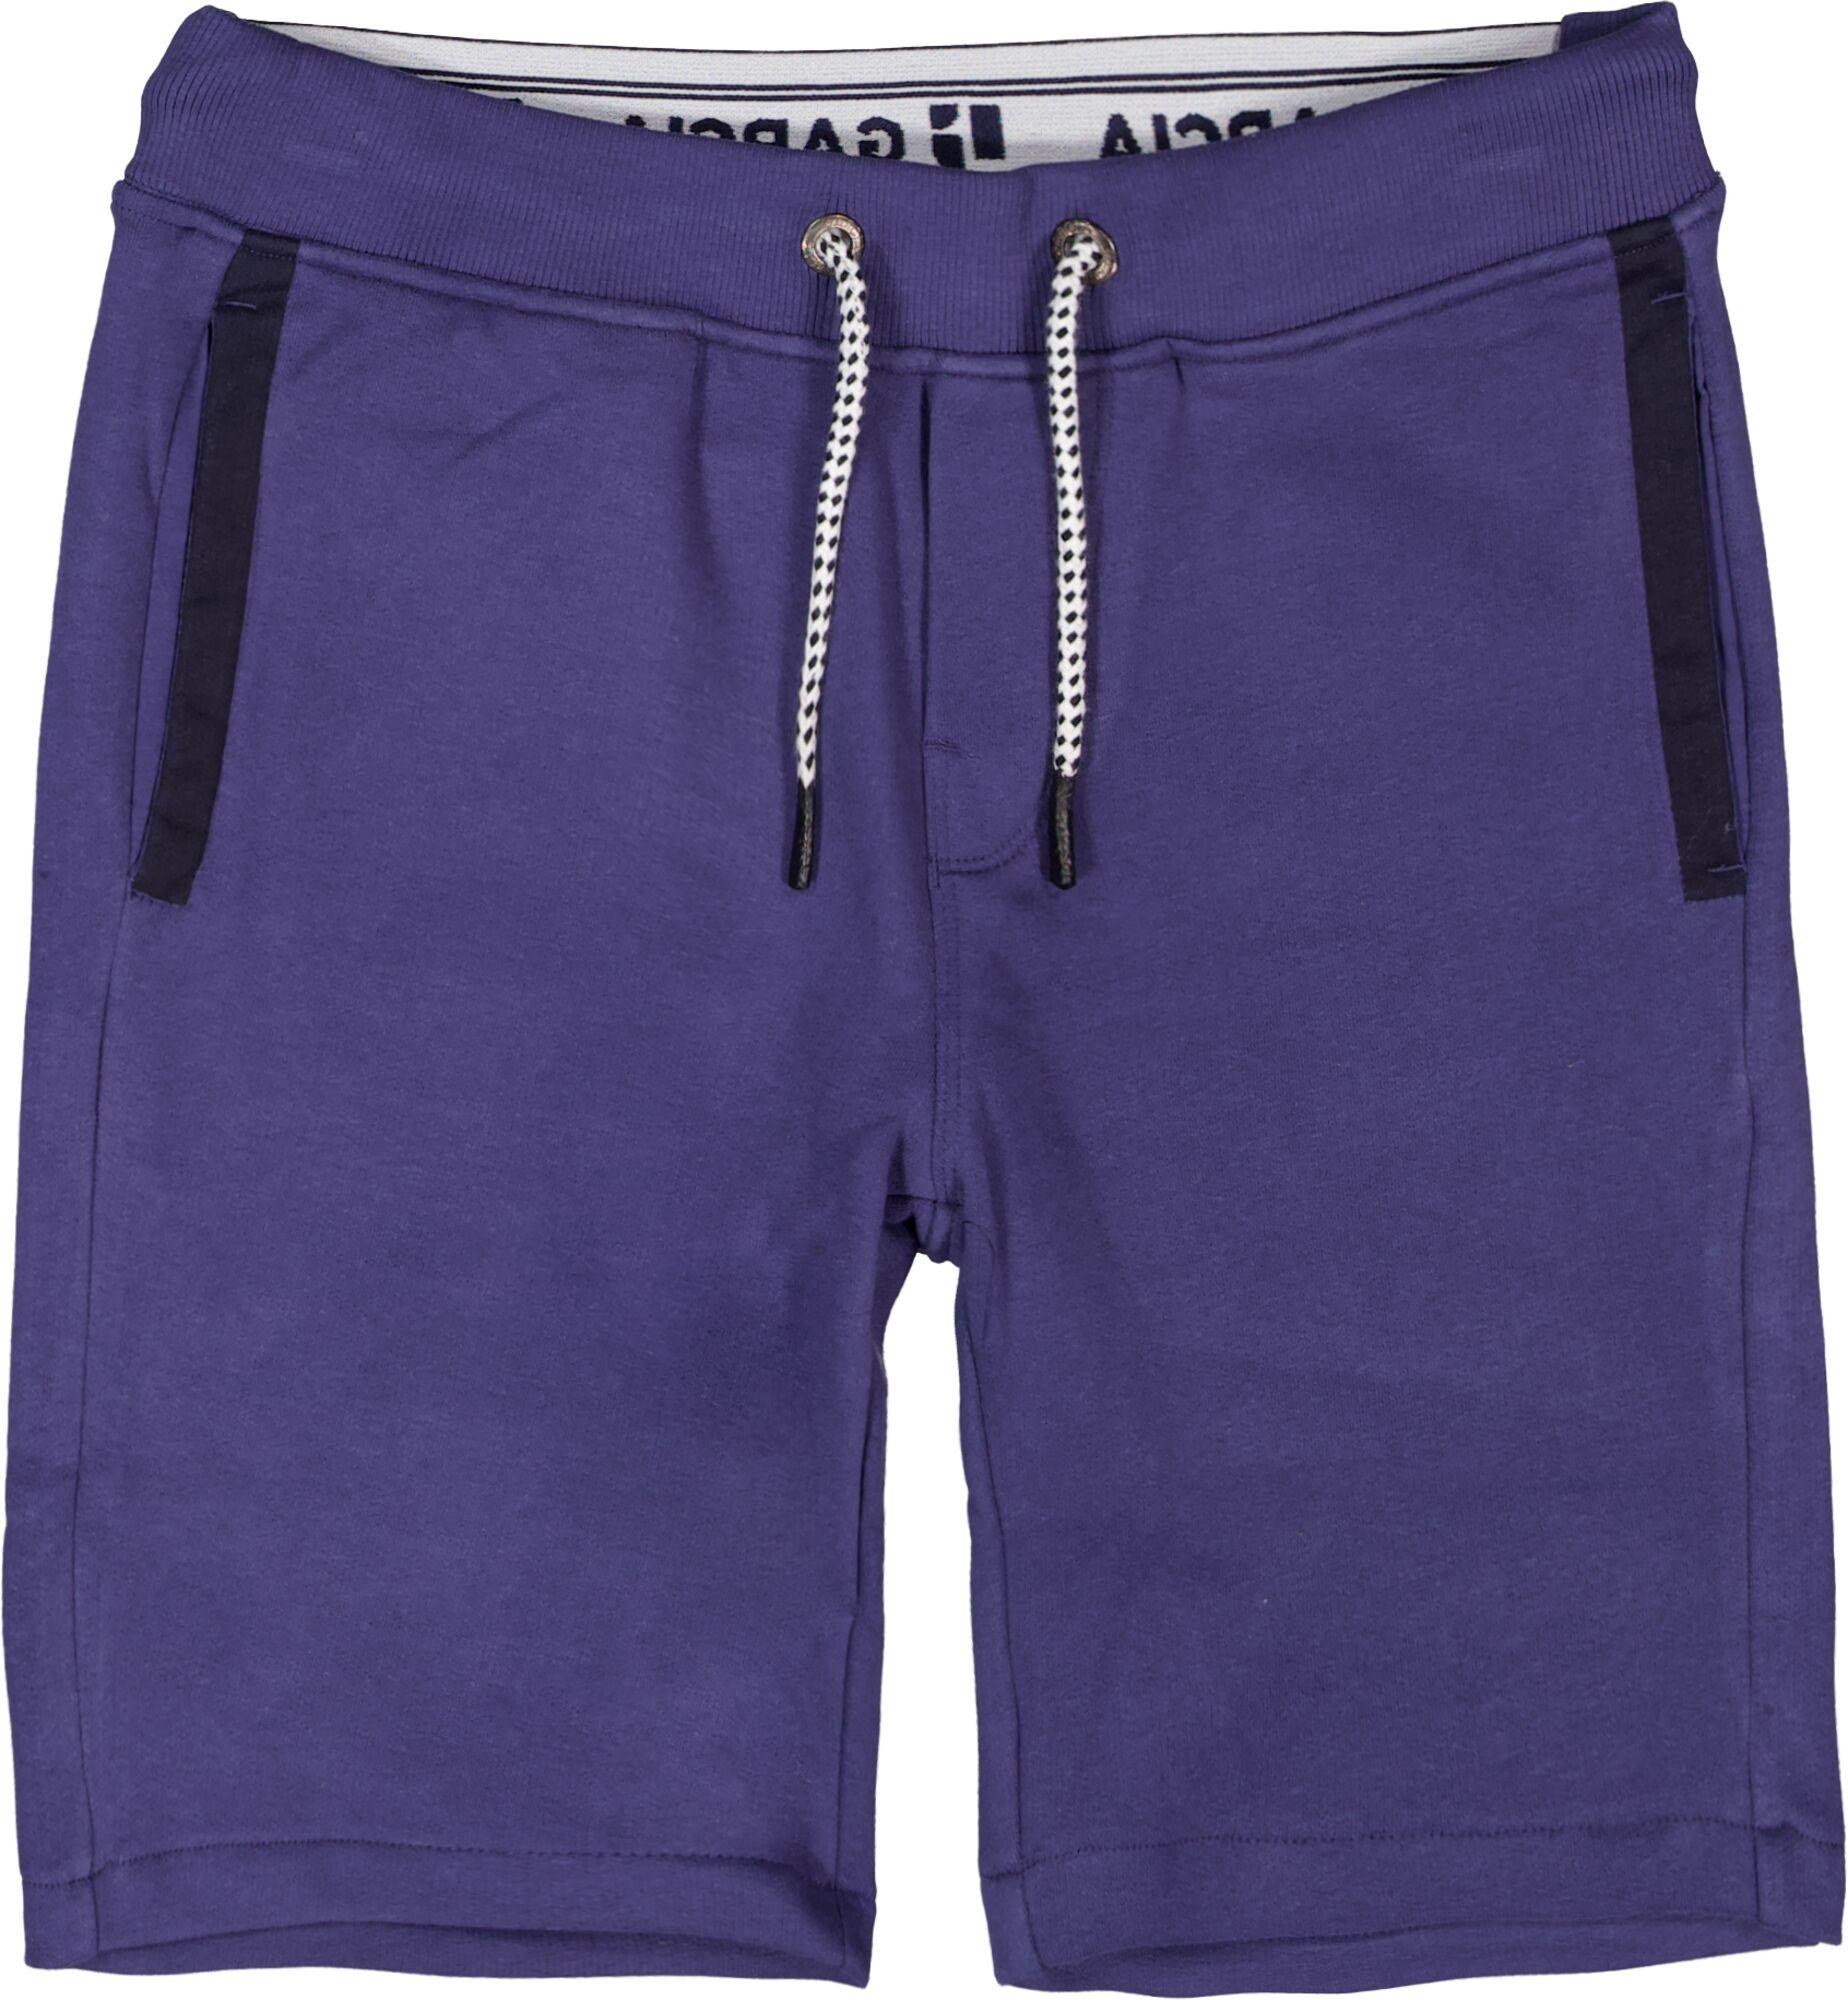 Garcia - Boys-Bermuda-Shorts